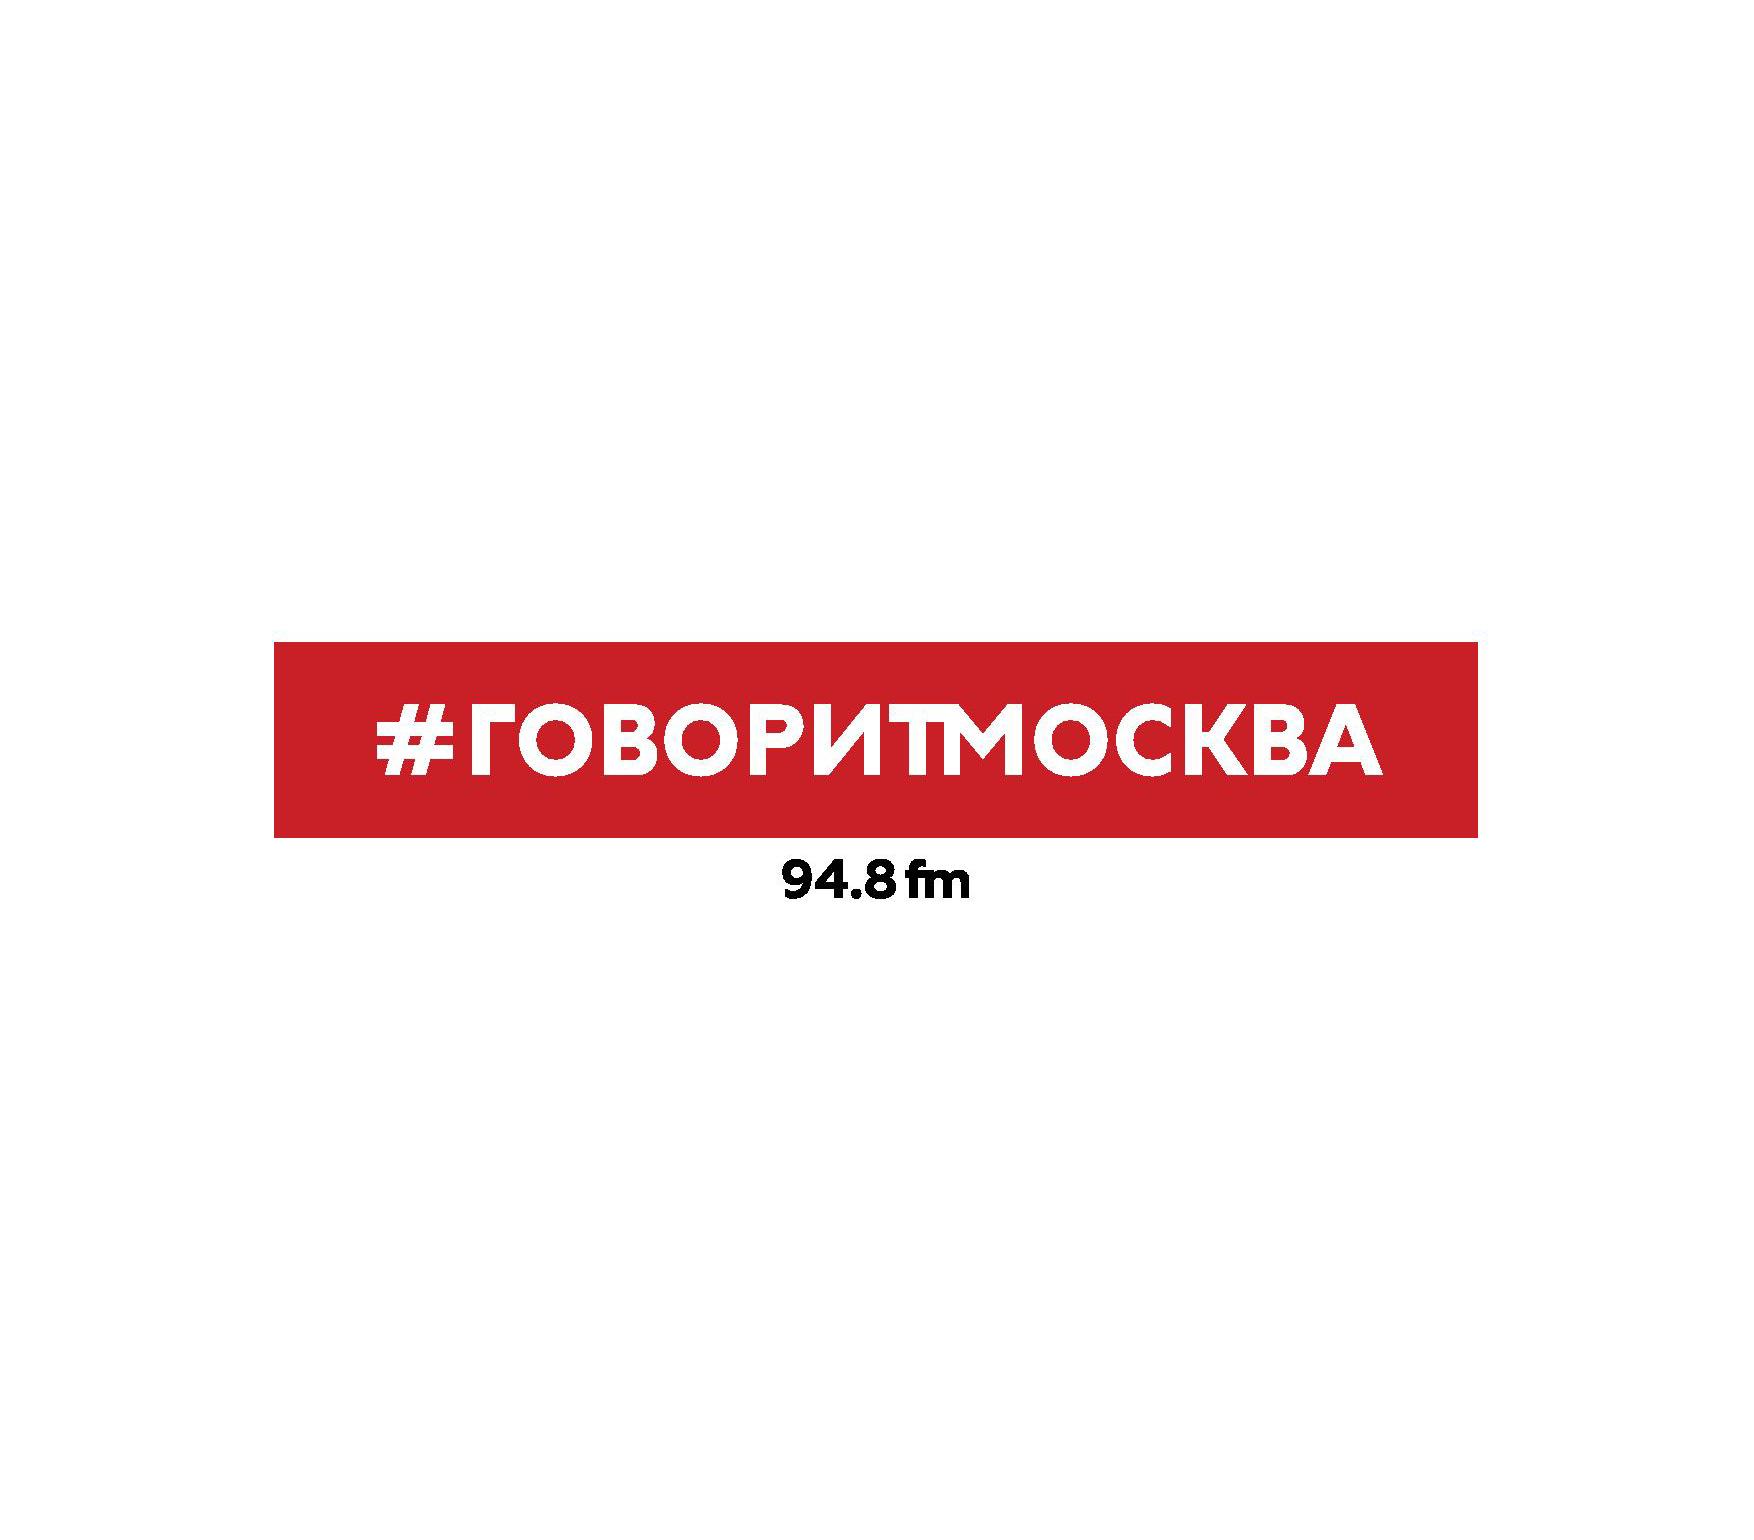 Макс Челноков 14 апреля. Андрей Орлов макс челноков 14 апреля андрей орлов